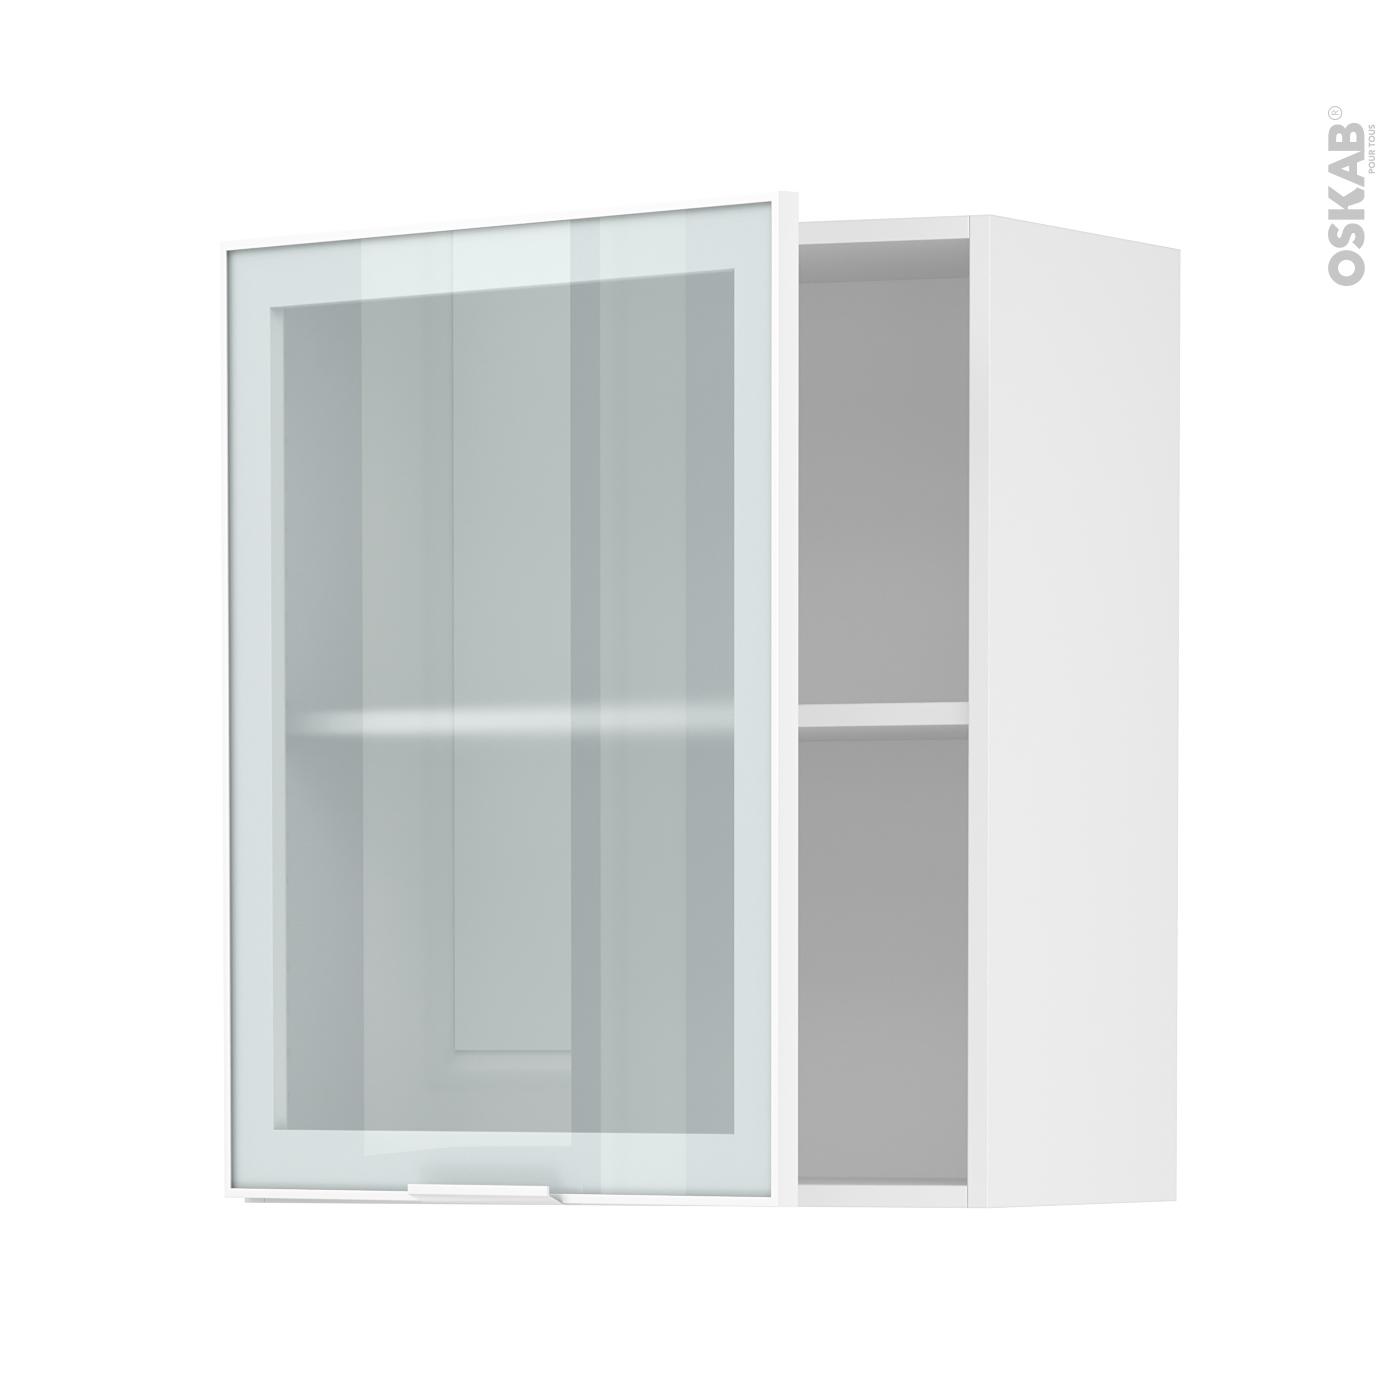 Meuble haut & bas cuisine vitré, Porte vitrée noir, blanc ou alu - Oskab